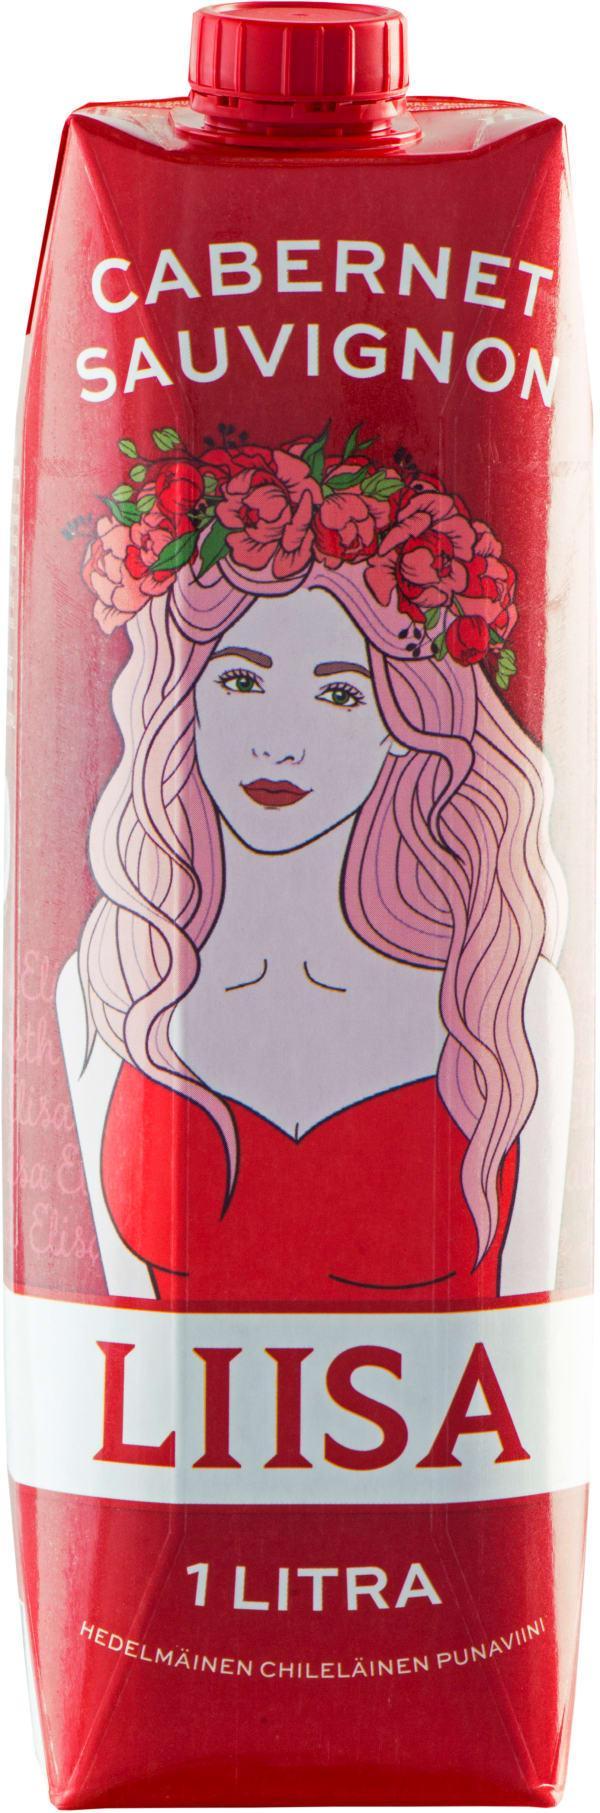 Liisa Rojo Reserva carton package